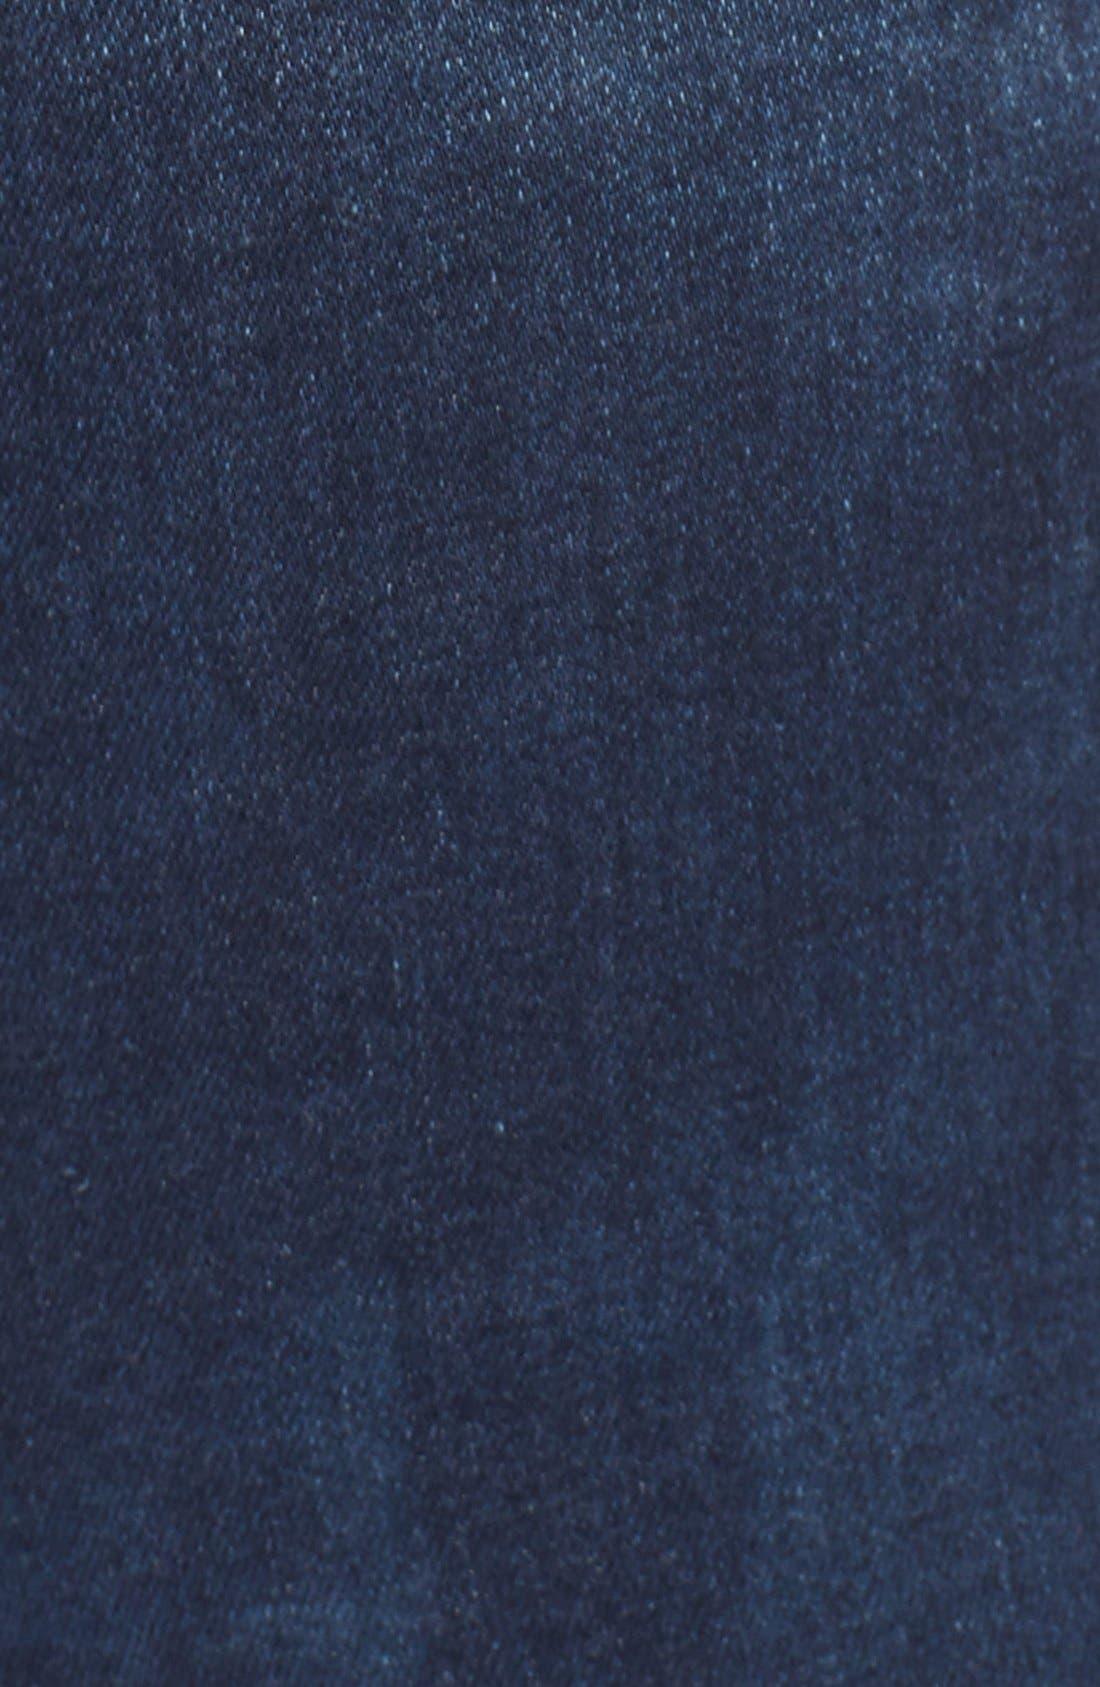 'Dismantle' Ripped Stretch Skinny Jeans,                             Alternate thumbnail 5, color,                             DARK DENIM